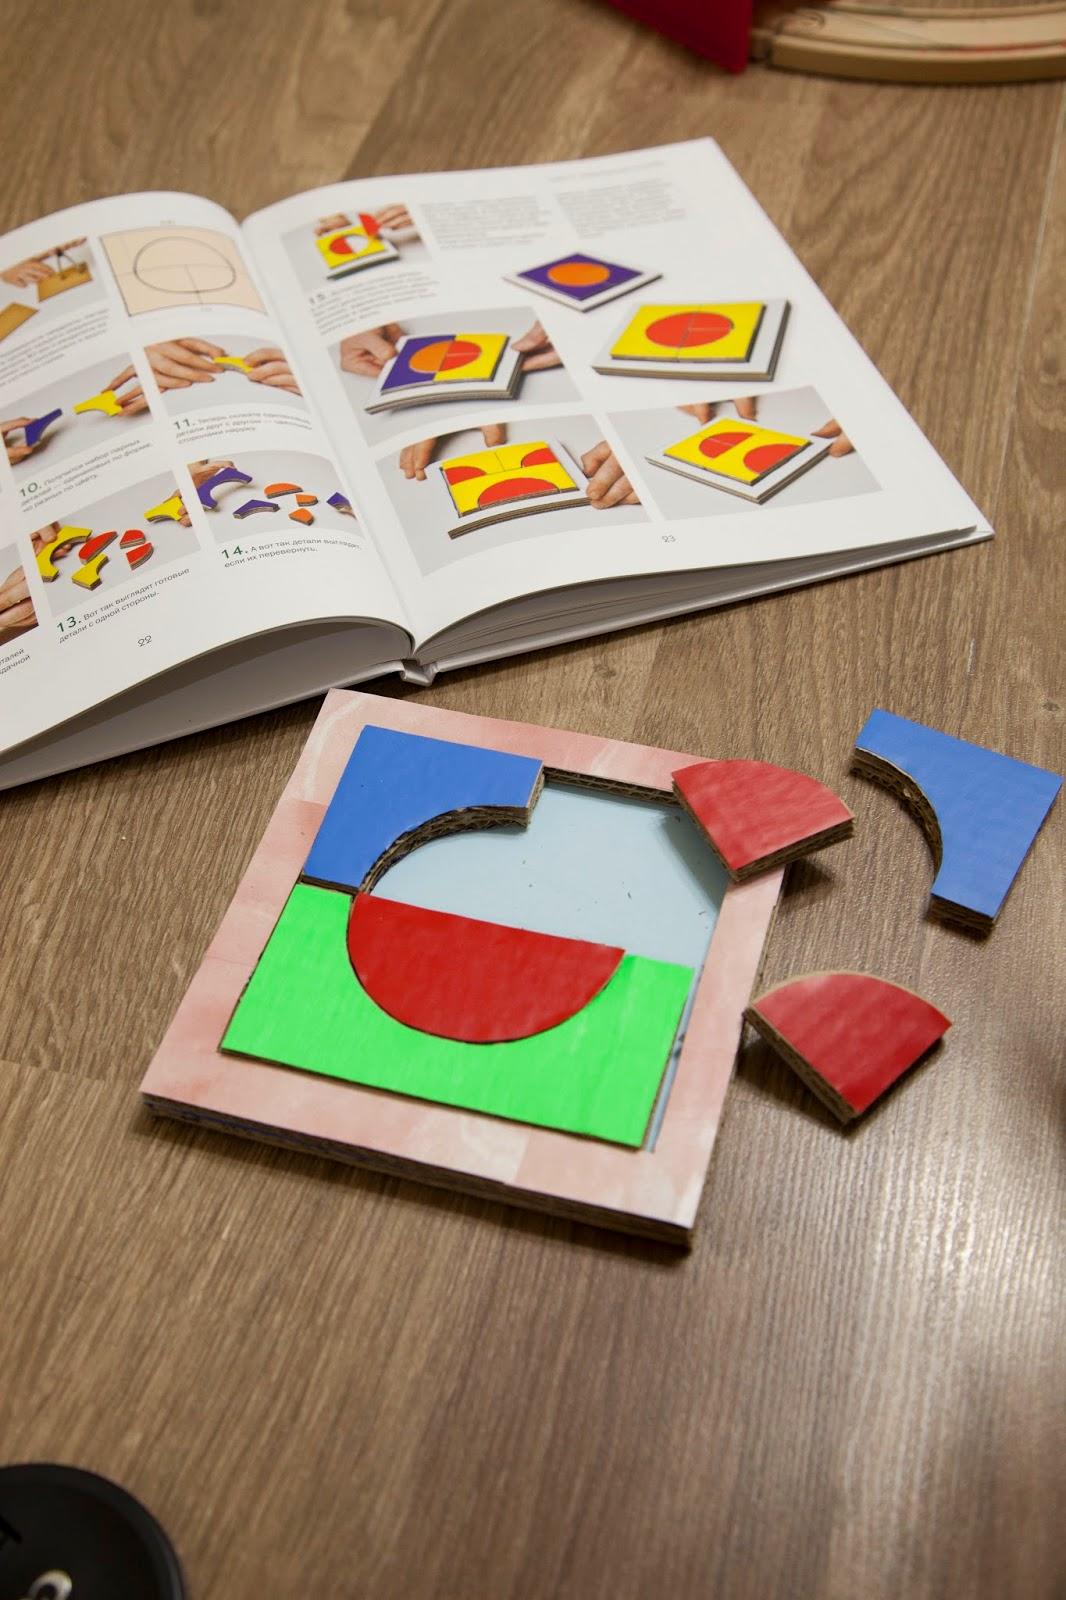 Развивающие игрушки из картона.